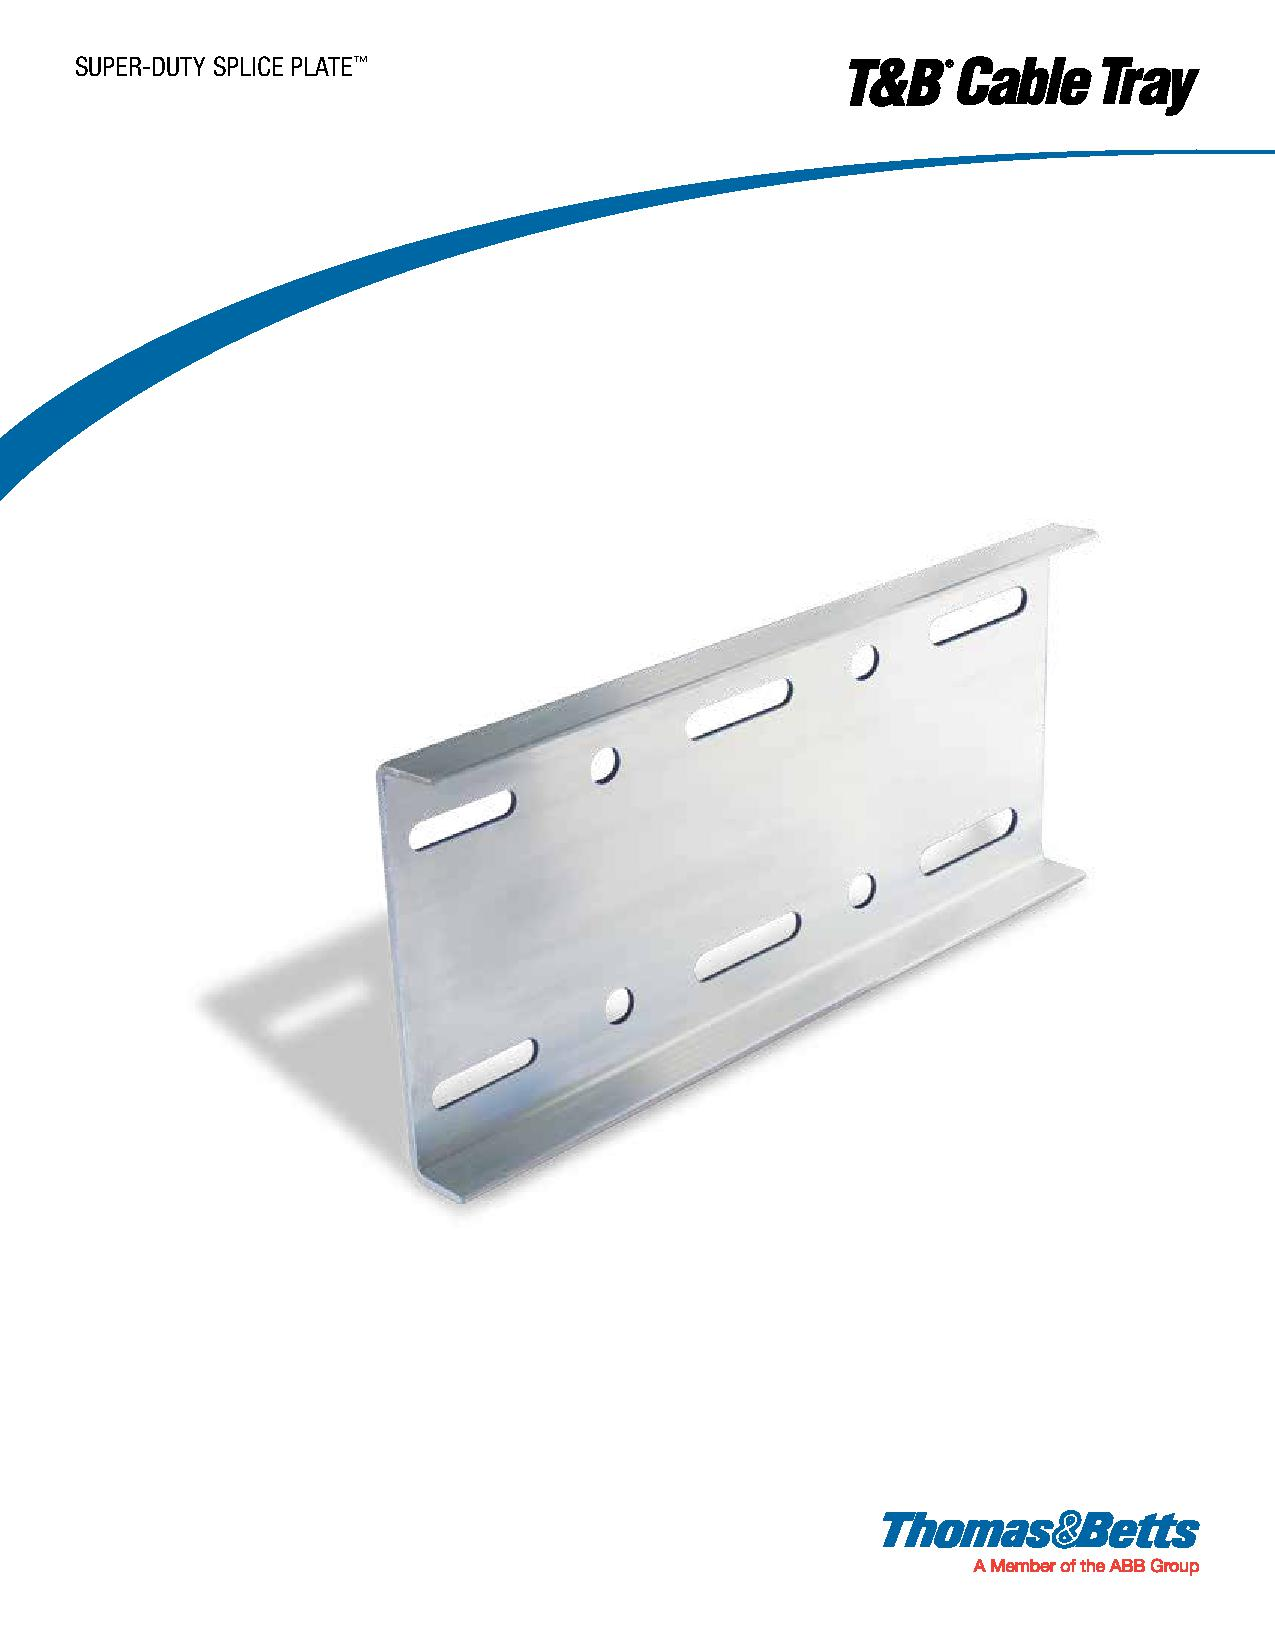 Tb Blackburn Solar Panel Feed Through Grounding Lug Ajb Sales Wiring Diagram Thomas Betts Super Duty Splice Plate For Cable Tray